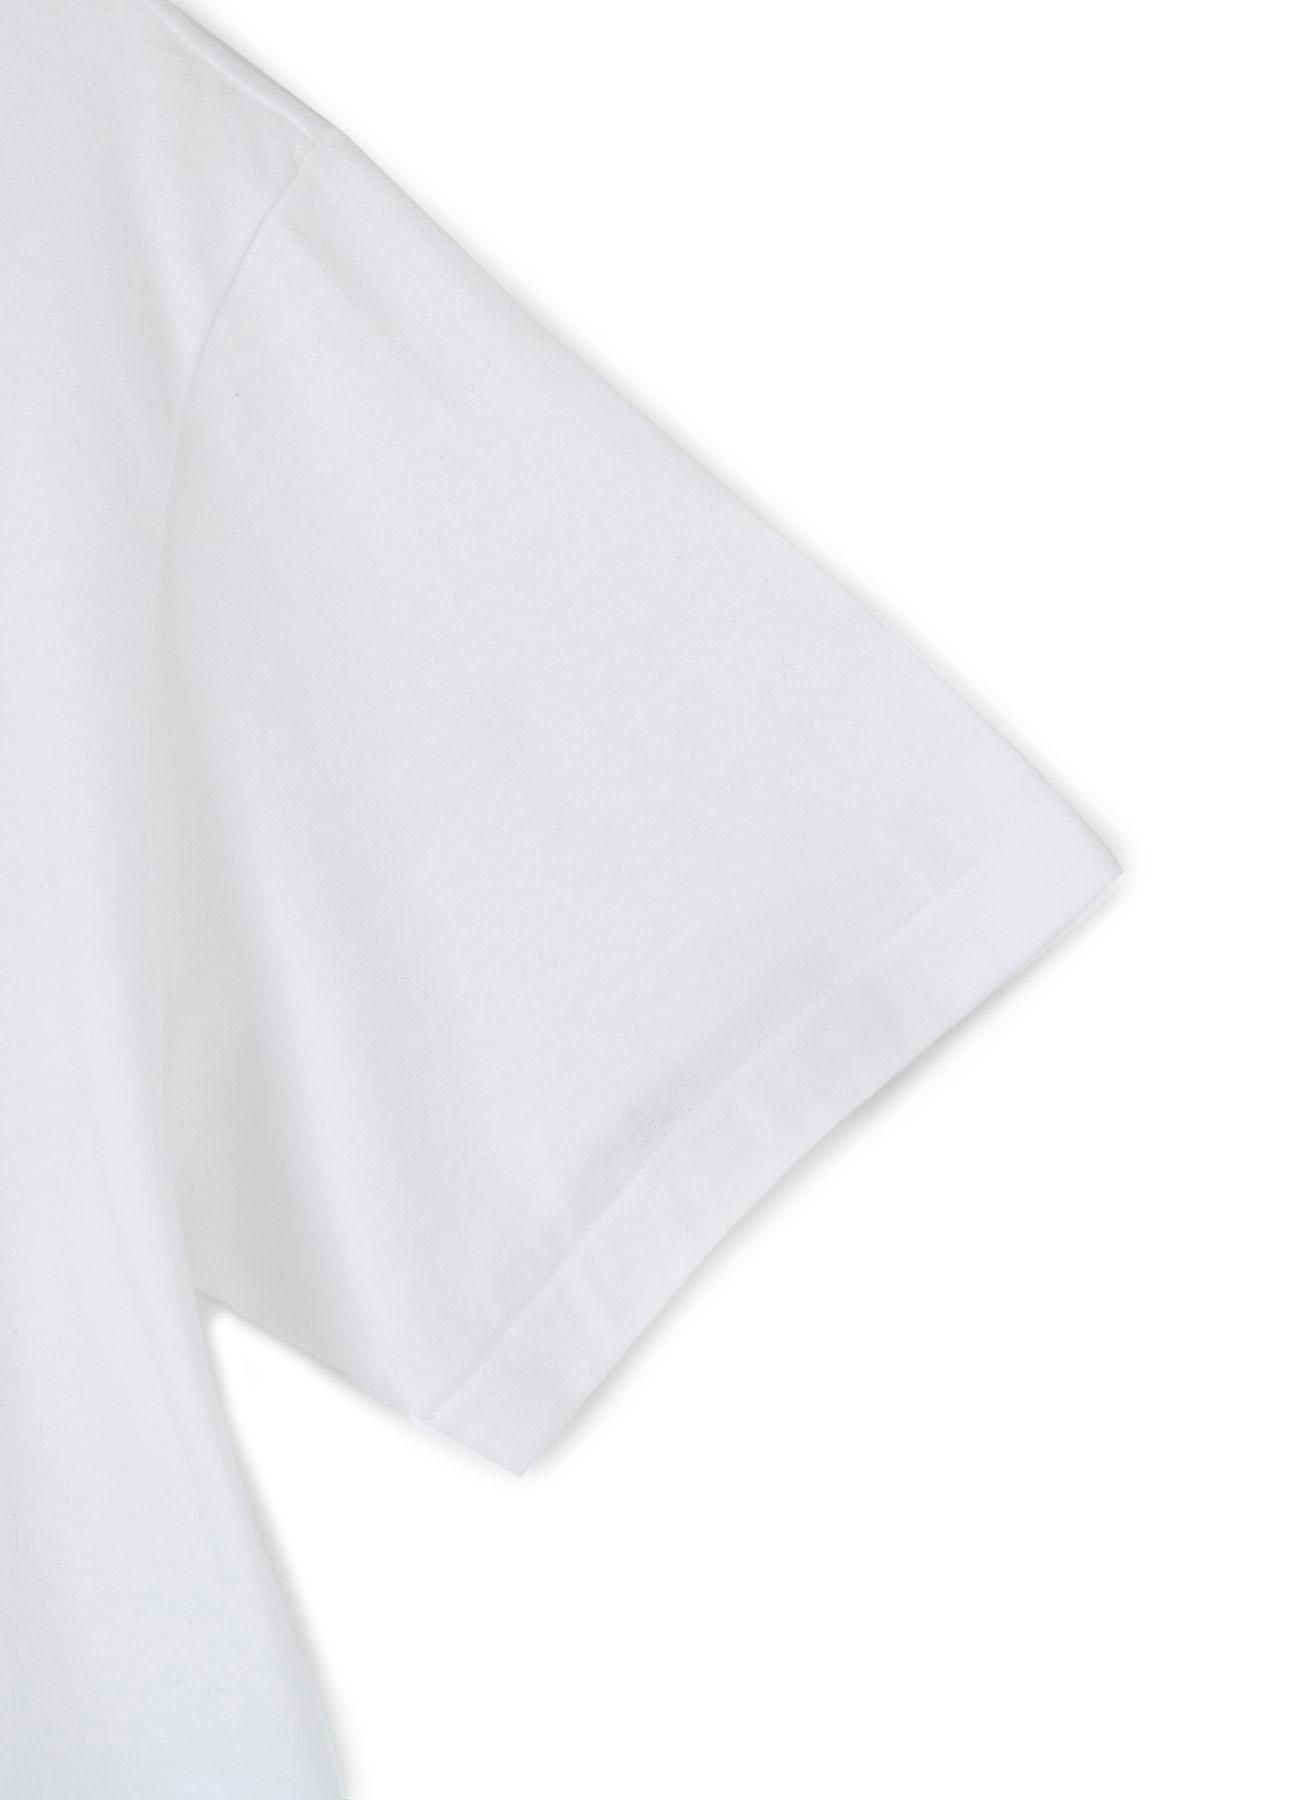 [THE SHOP Limited Product] 20/-Plain Stitch LIMI FEU Print T-Shirt A